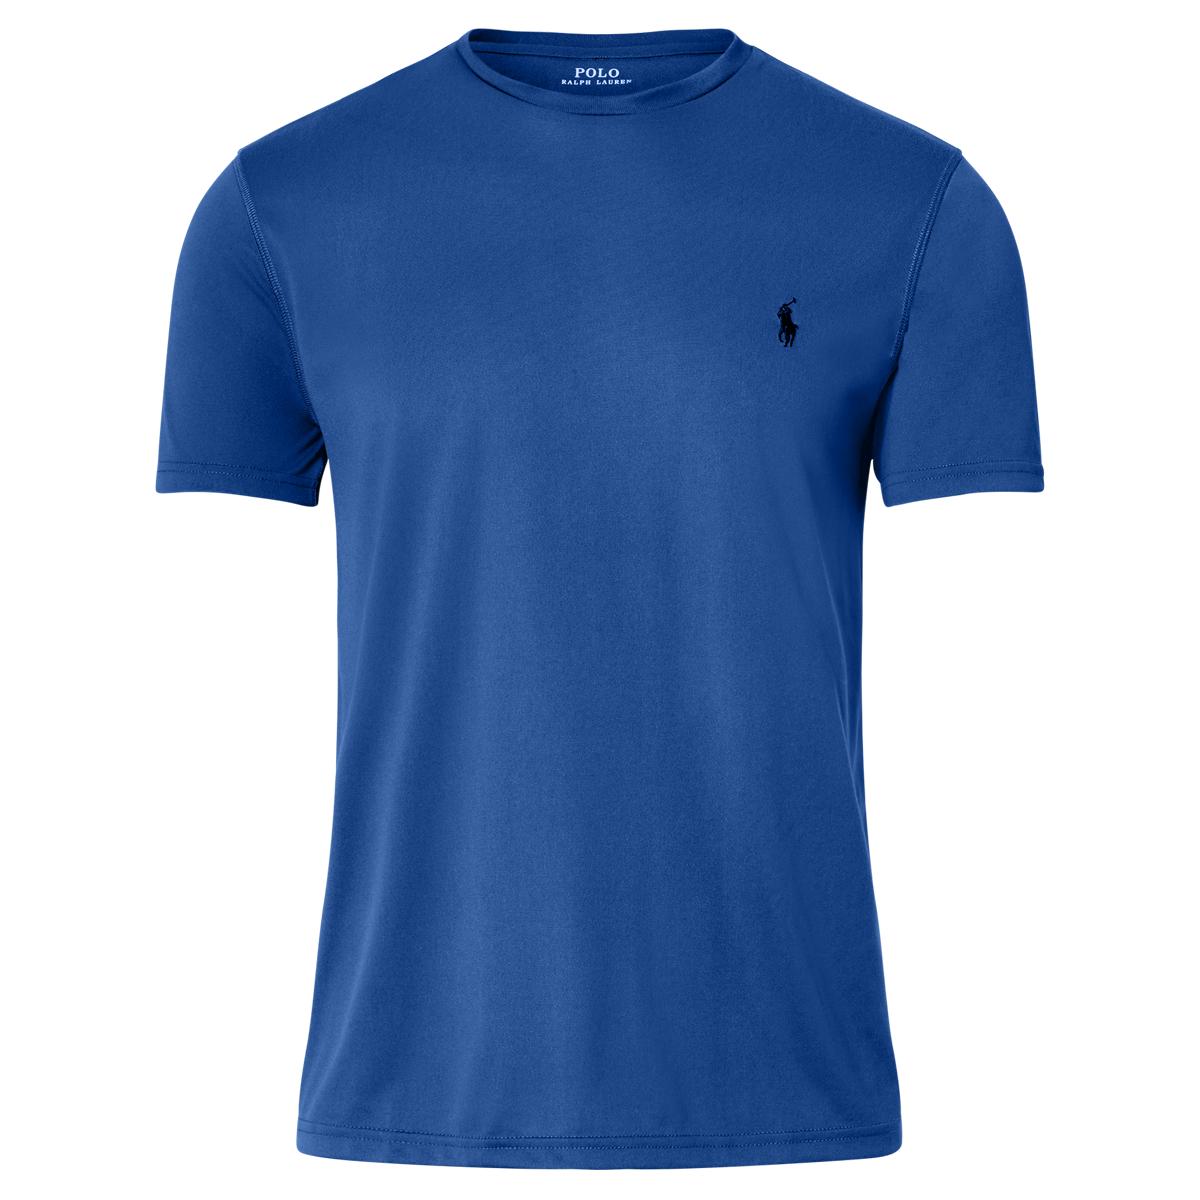 0f147bac Performance Jersey T-Shirt | Tees T-Shirts & Sweatshirts | Ralph Lauren